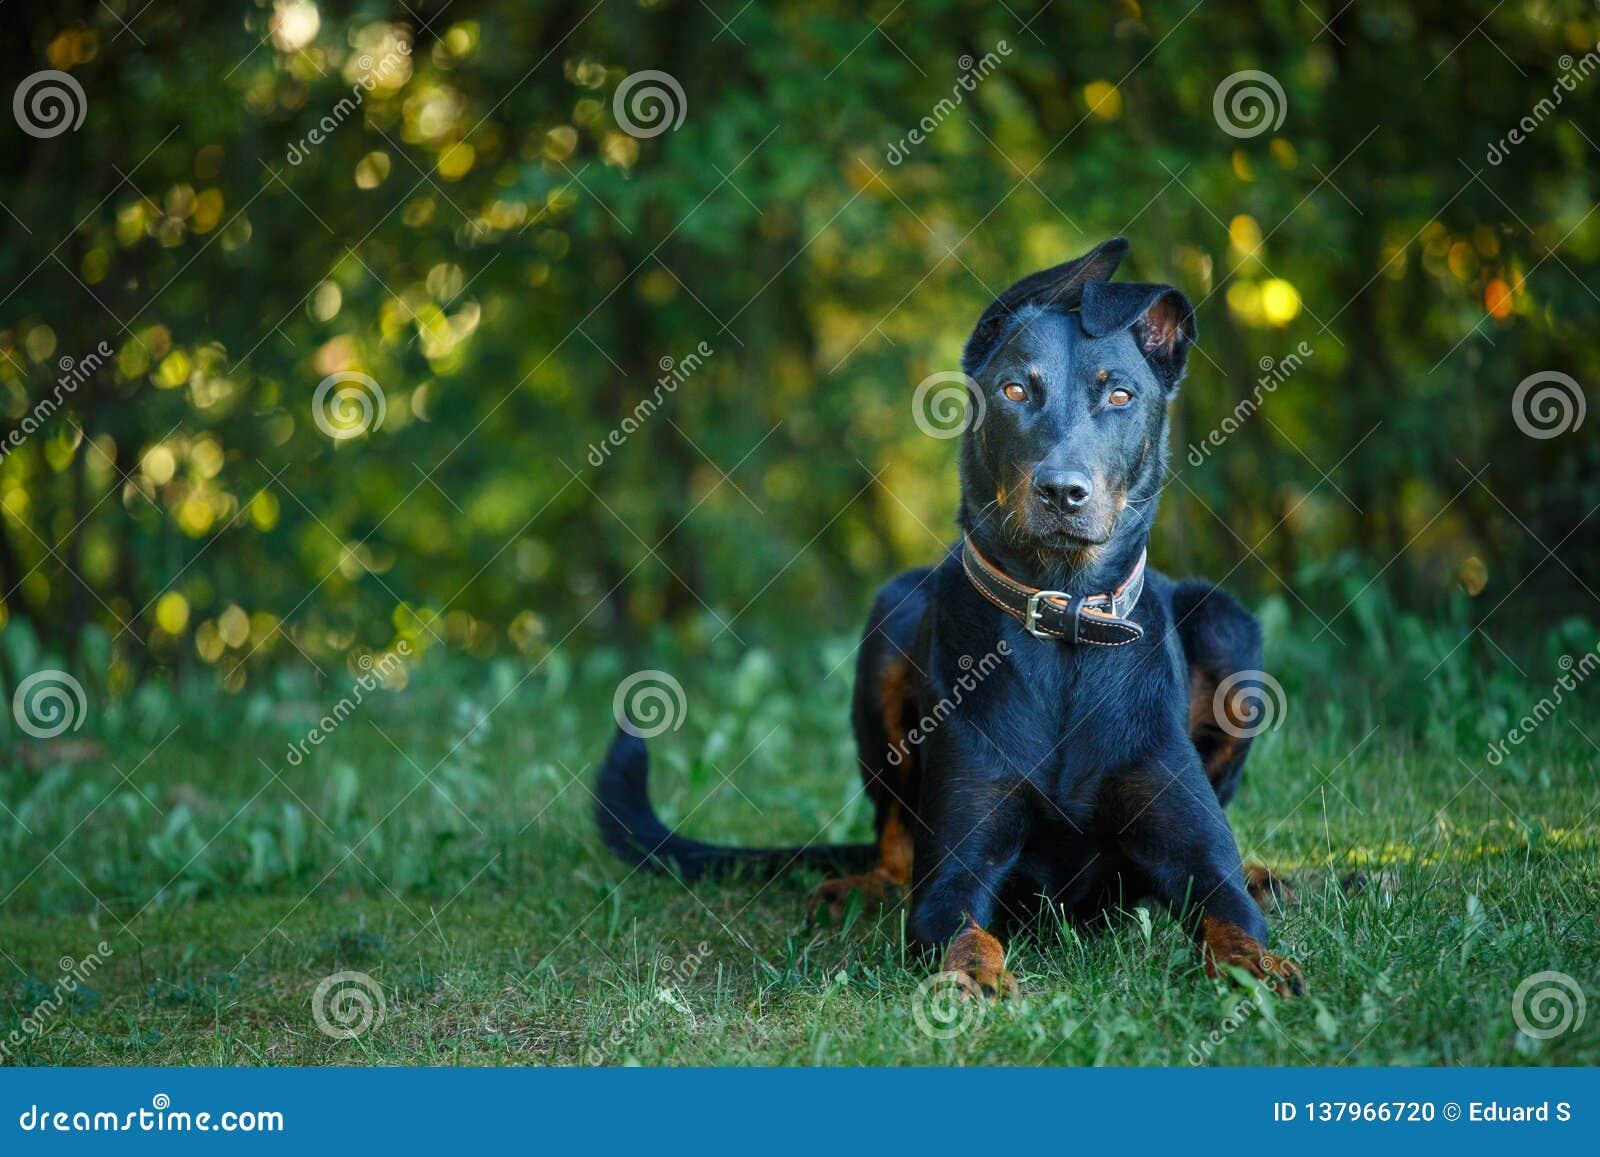 Black and tan Doberman pintcher laying outside